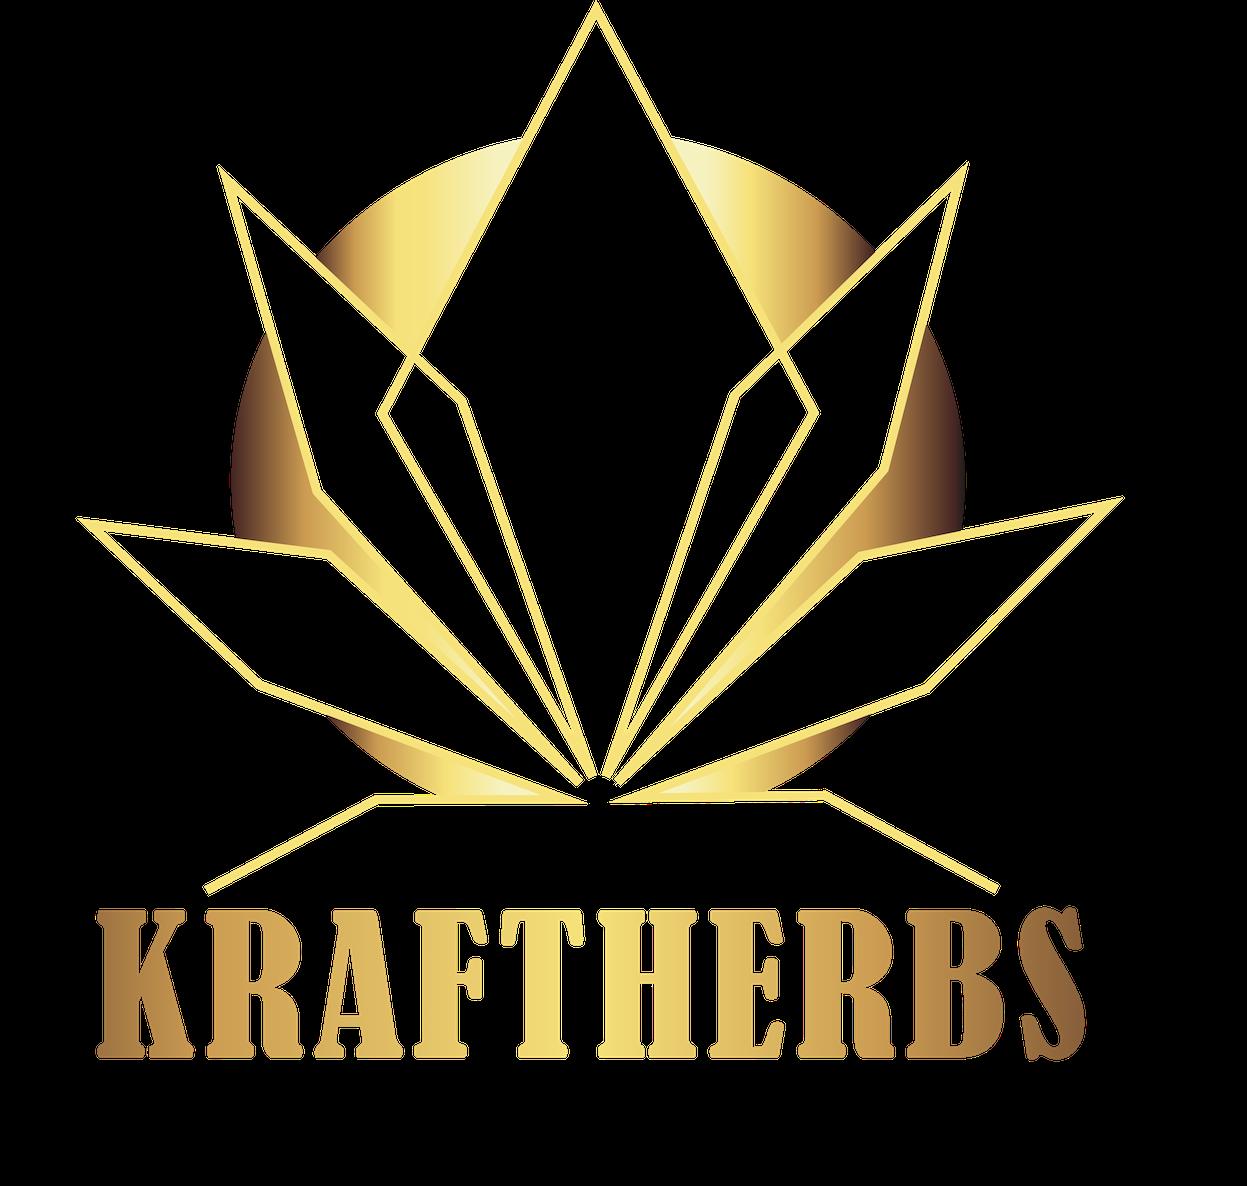 Kraftherbs logo